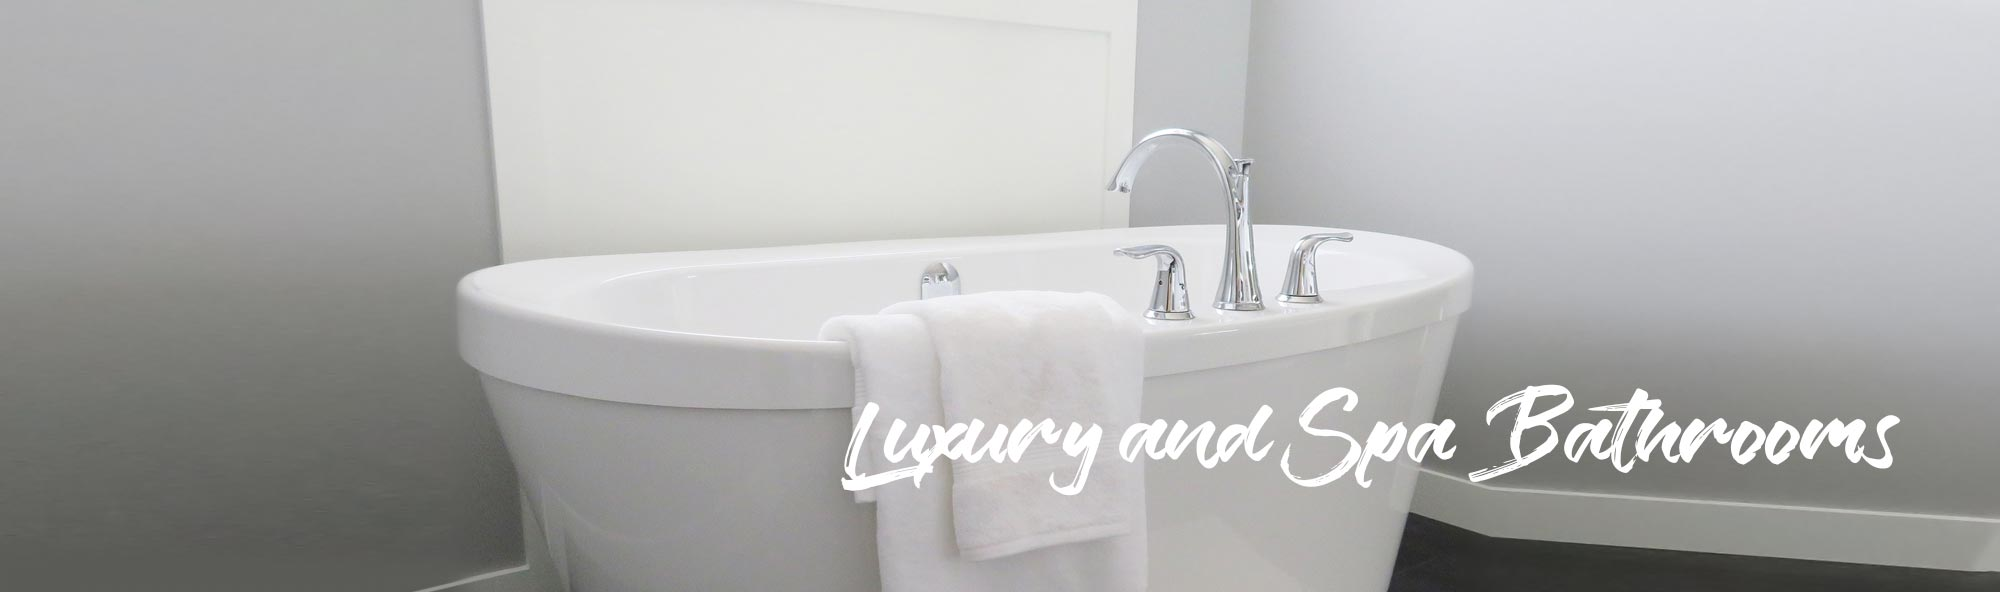 luxury-and-spa-bathrooms, Kitchen Renovation, Bathroom Renovation, House Renovation Auckland